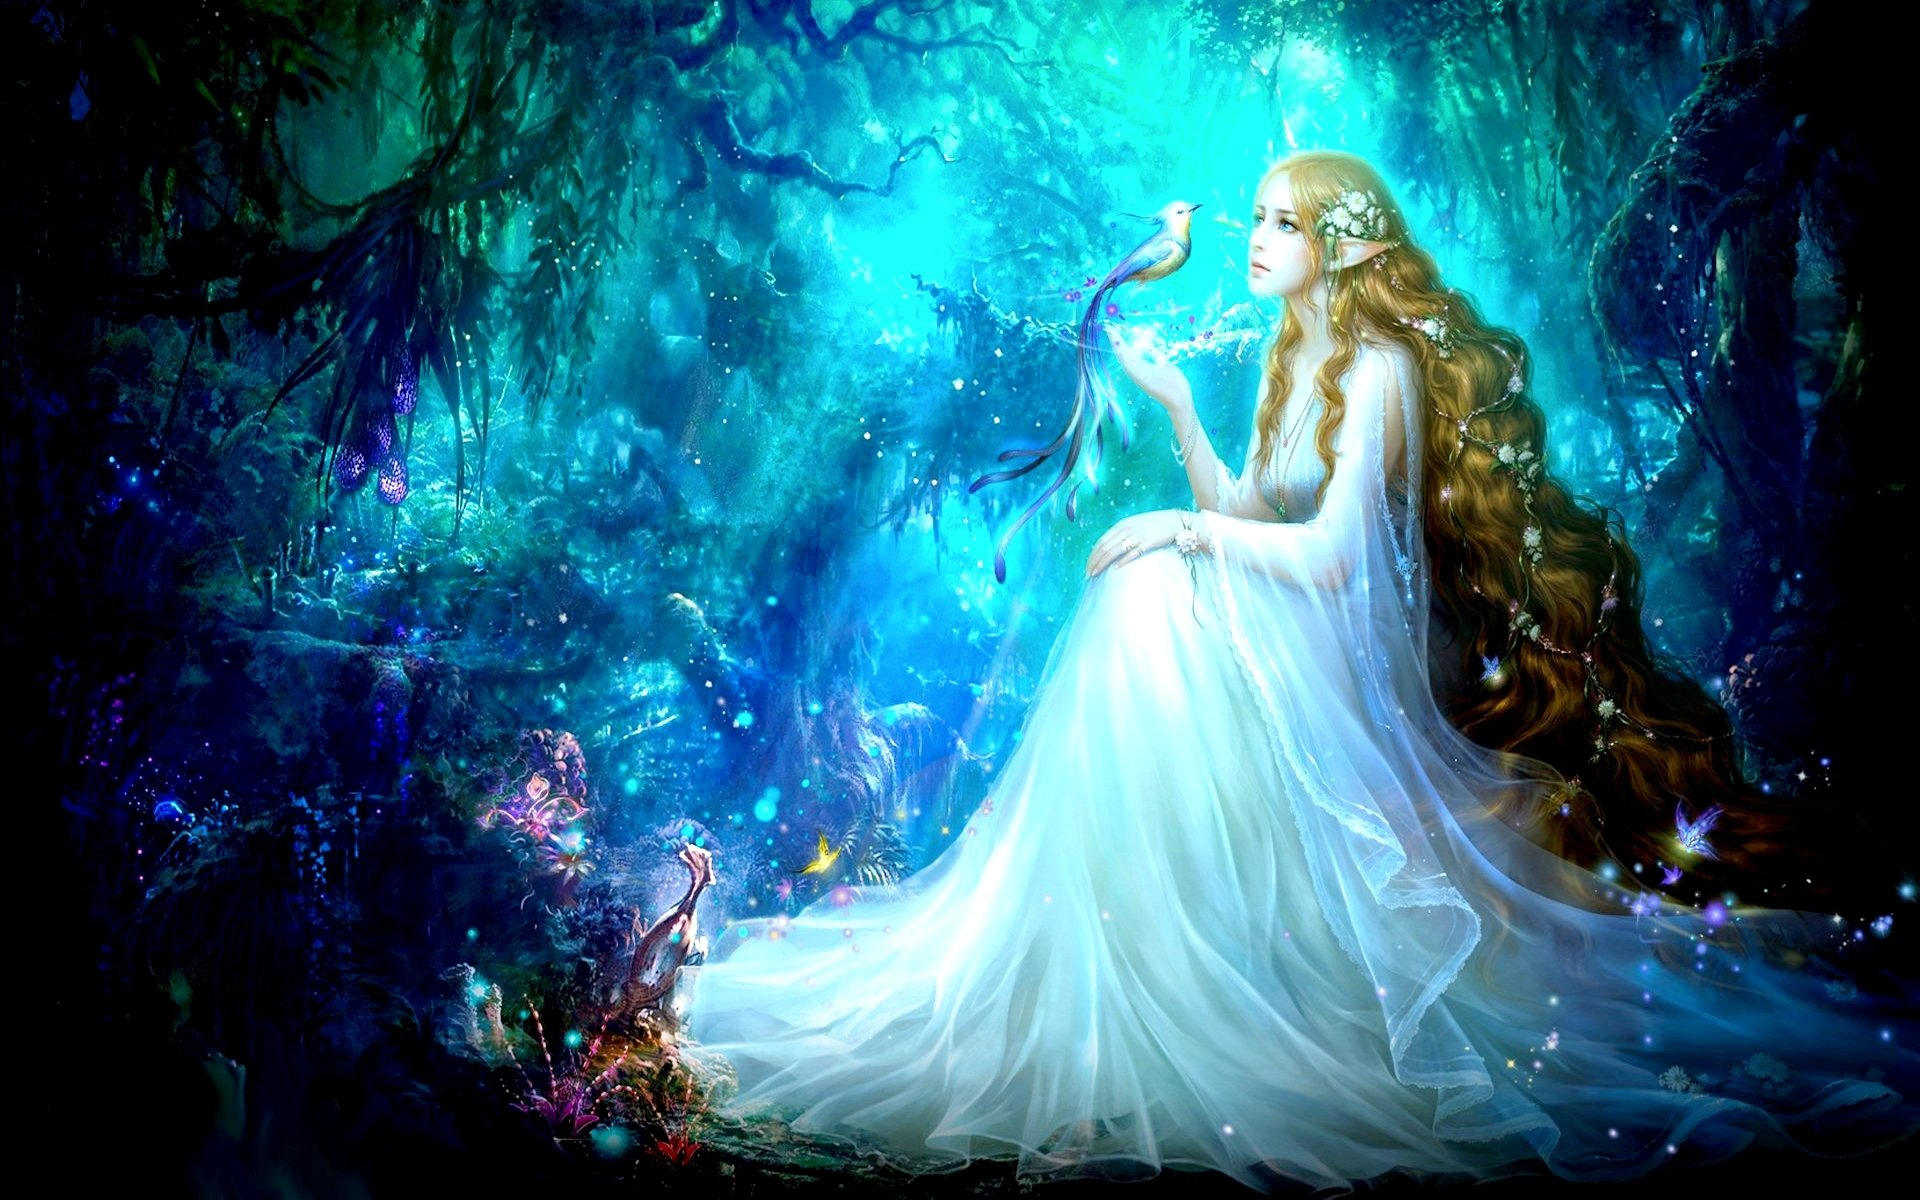 Fantasy Art Elves Wallpapers Hd Desktop And Mobile: Forest Fantasy Elf HD Wallpaper